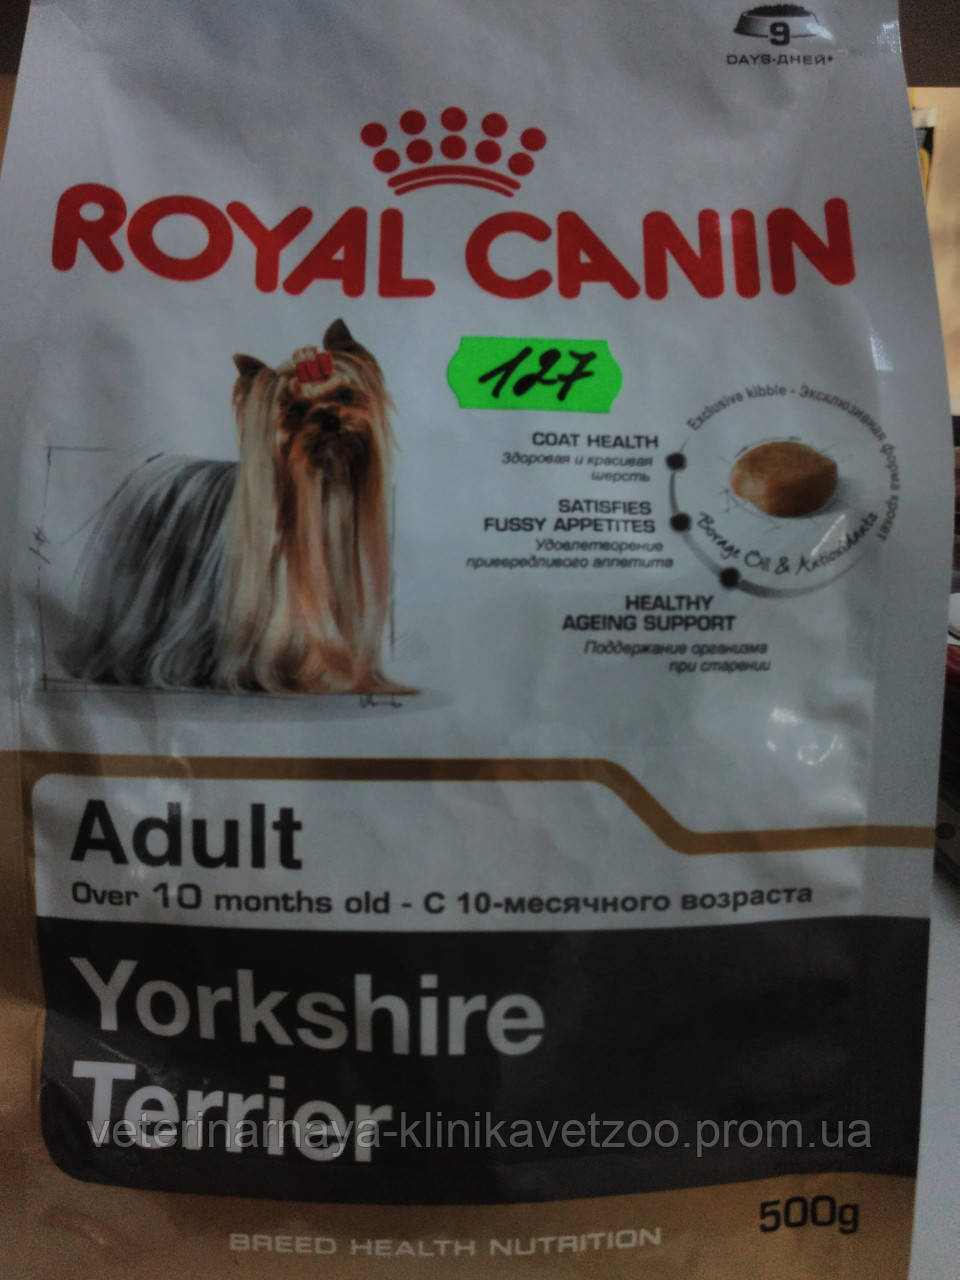 Royal Canin(Yorkshire Terrier adult)корм  для йоркширского терьера от 10мес 500г,1.5кг,7.5кг..